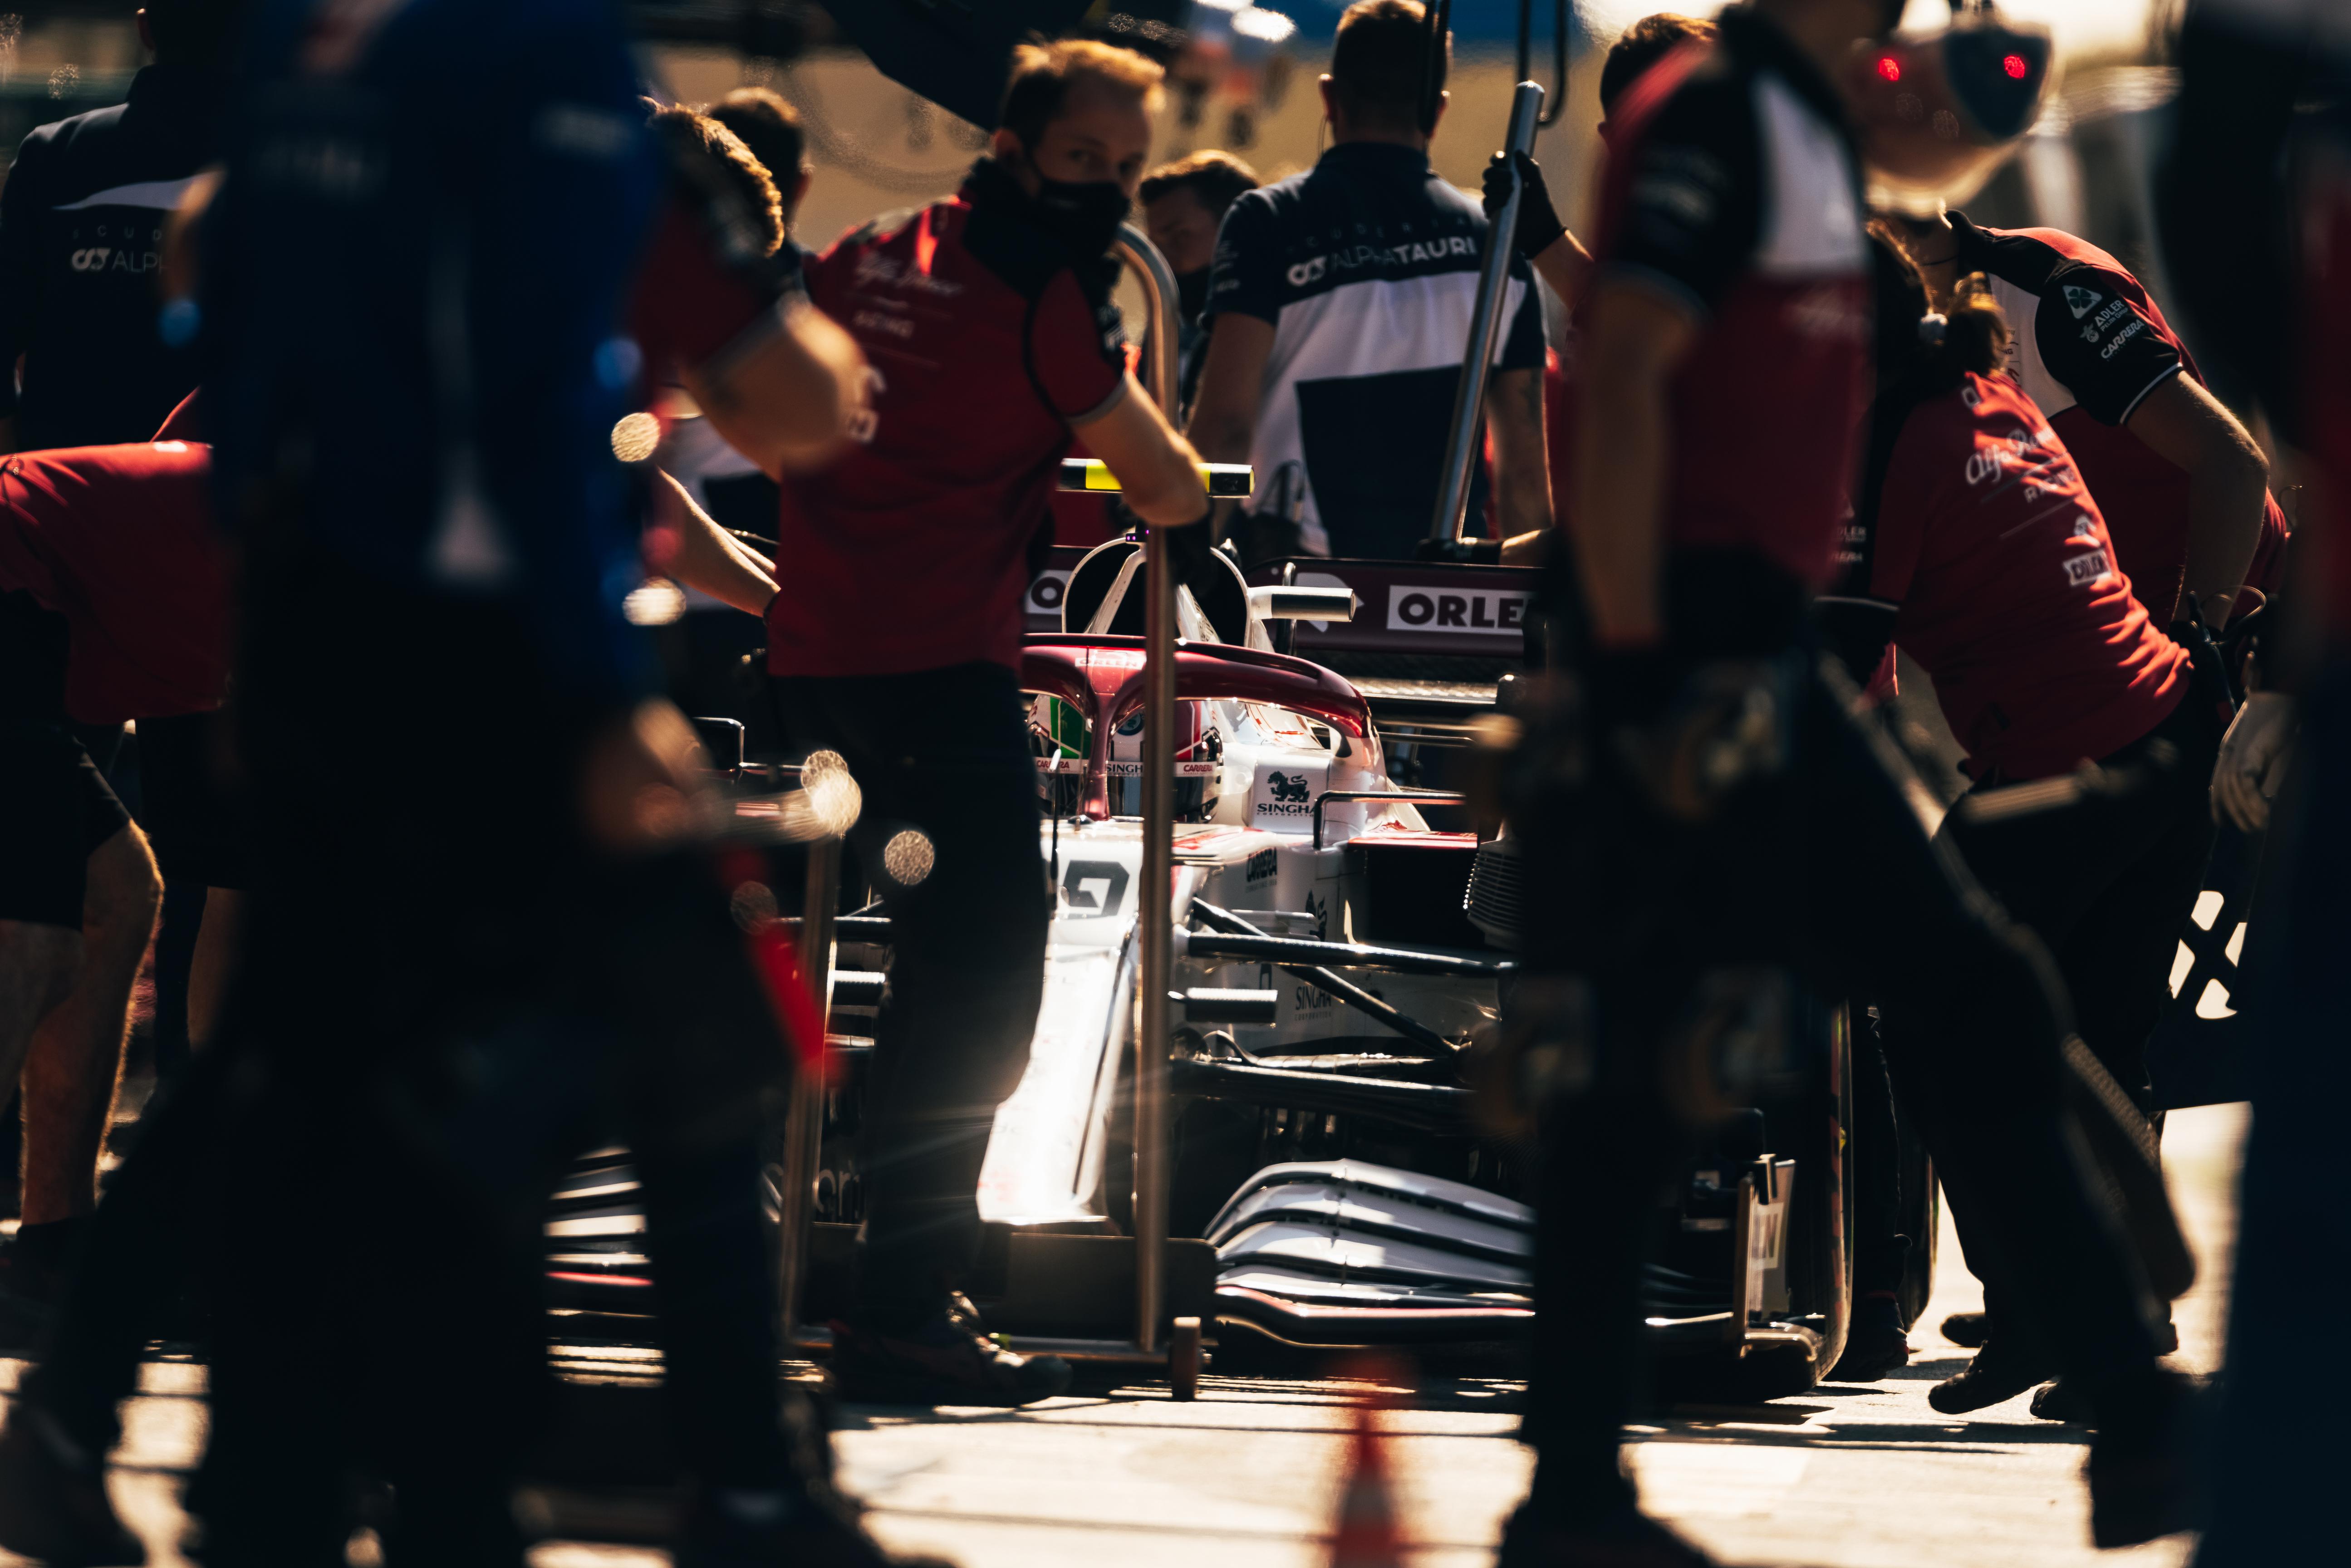 Motor Racing Formula One World Championship Dutch Grand Prix Qualifying Day Zandvoort, Netherlands